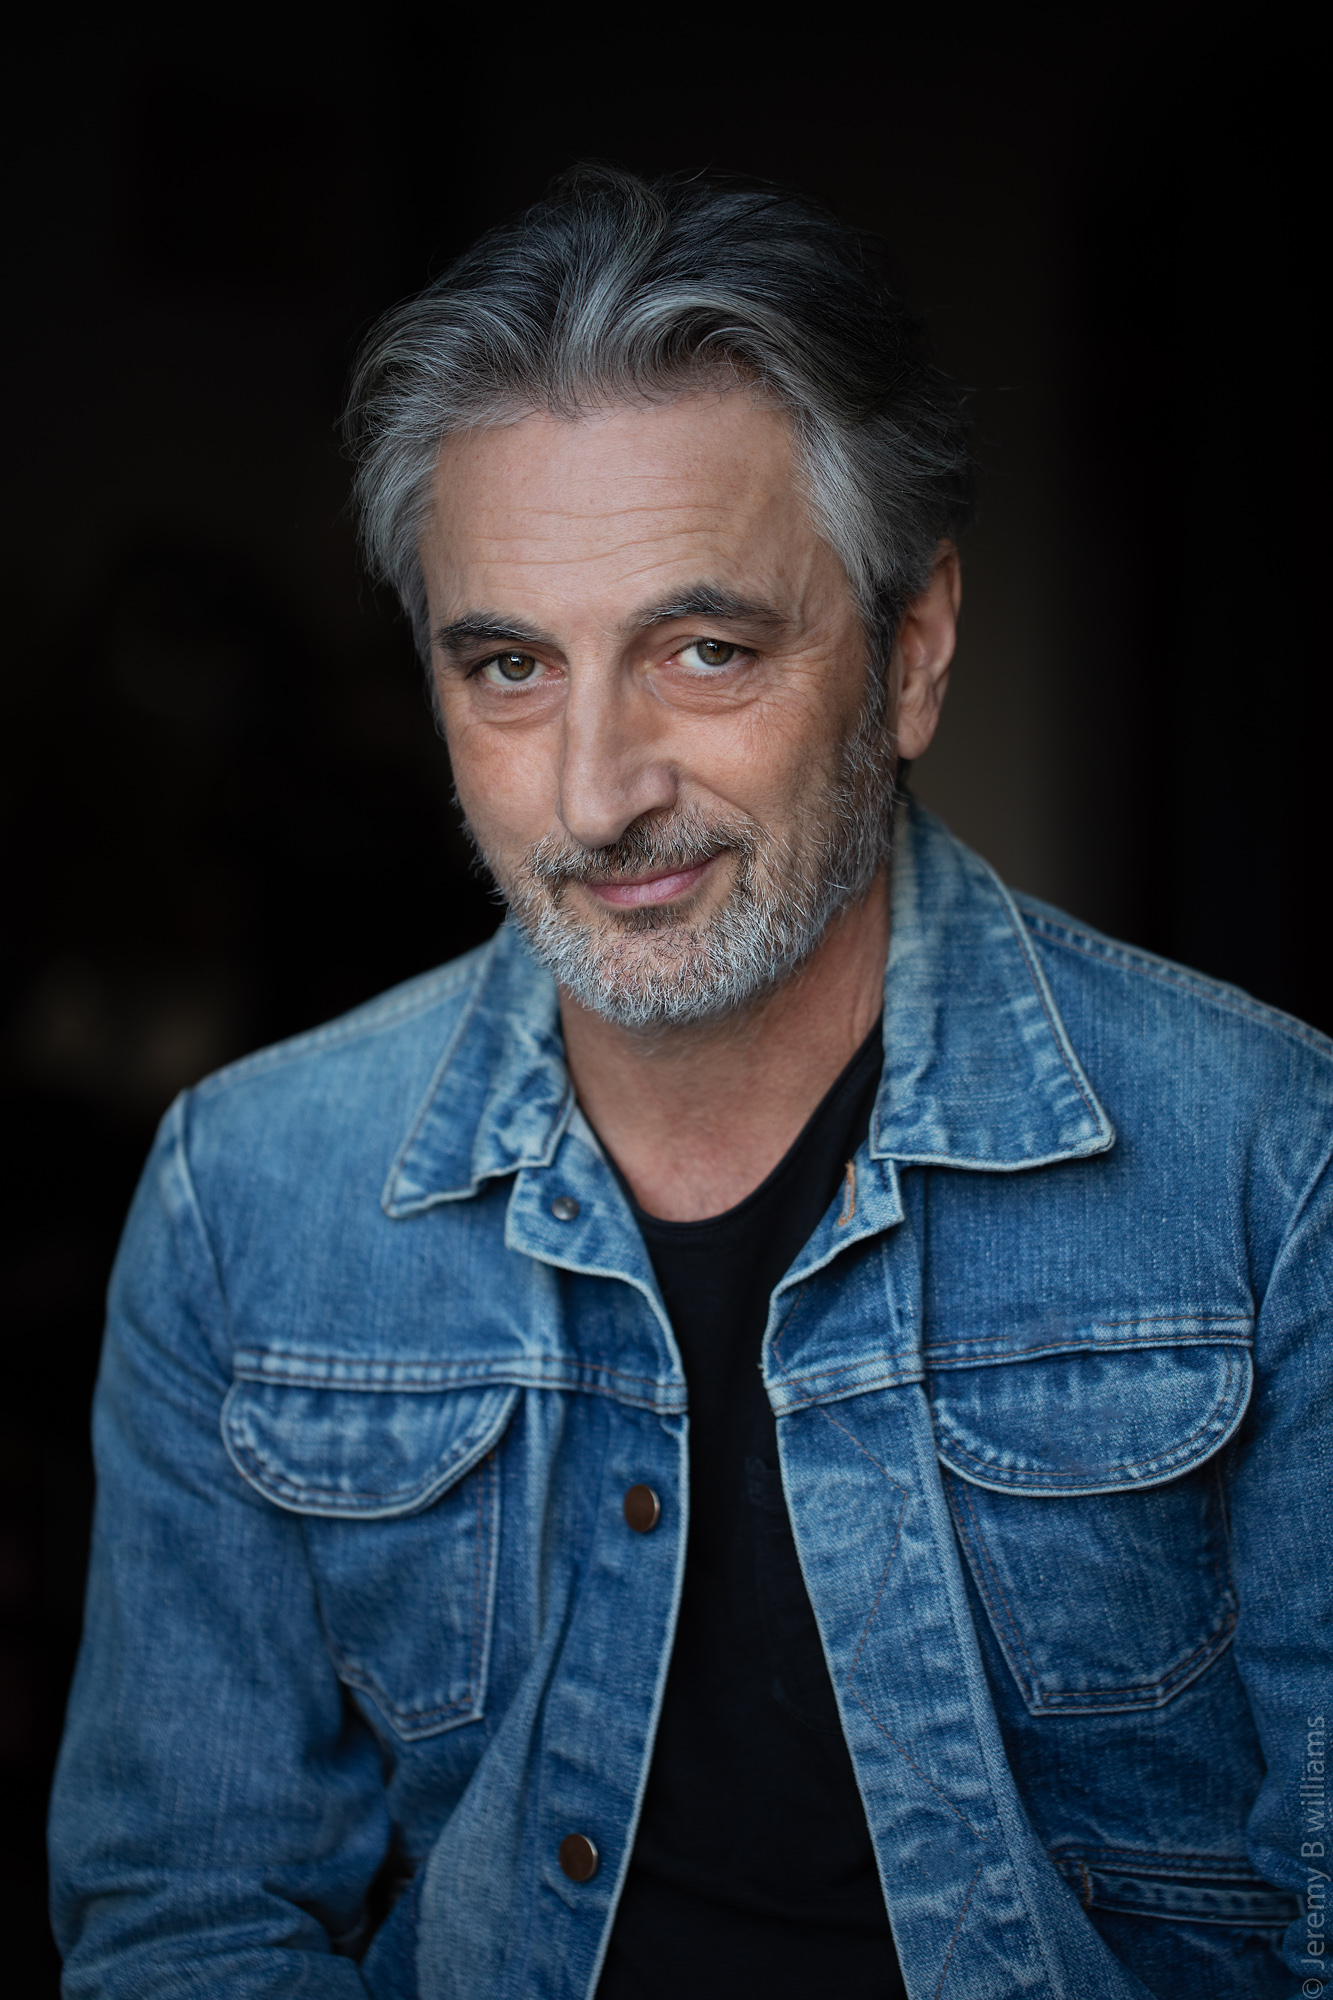 Jean-Luc Rehel